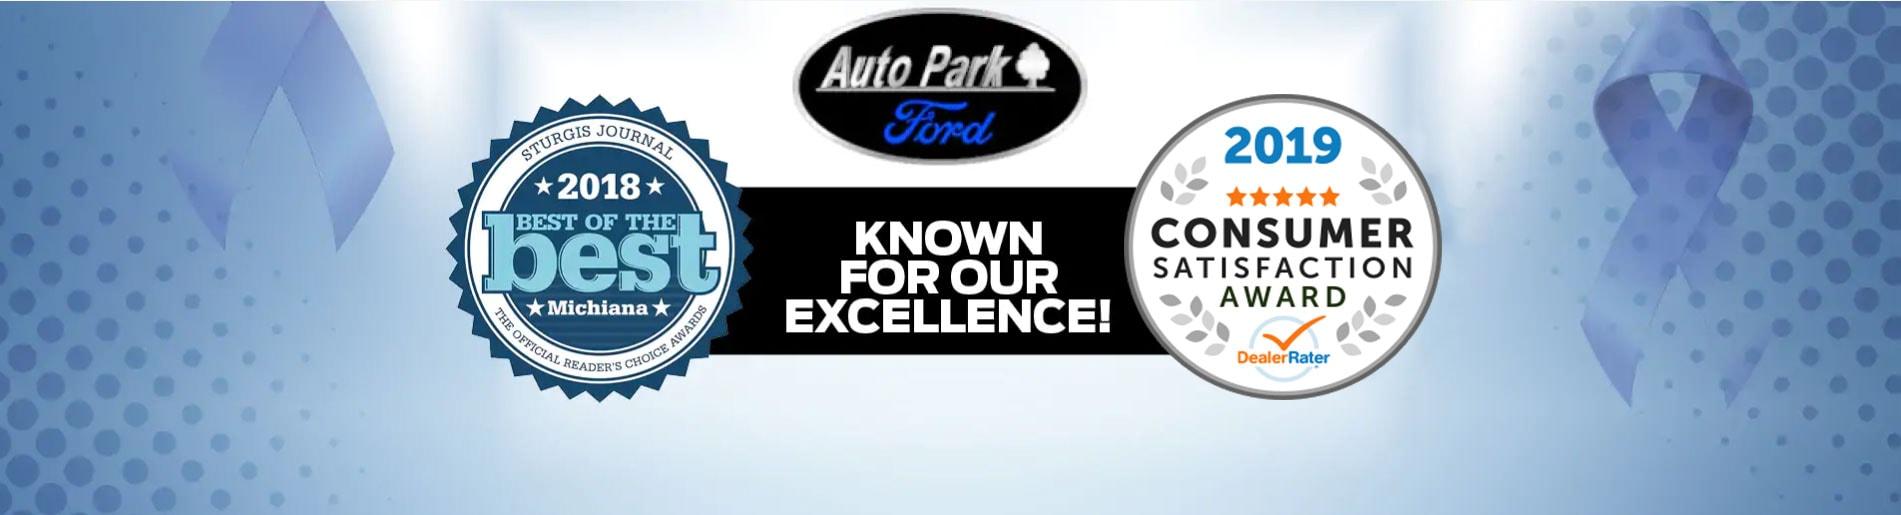 Auto Park Ford Sturgis Mi >> New 2019 Ford Used Car Dealer In Sturgis Mi Serving Three